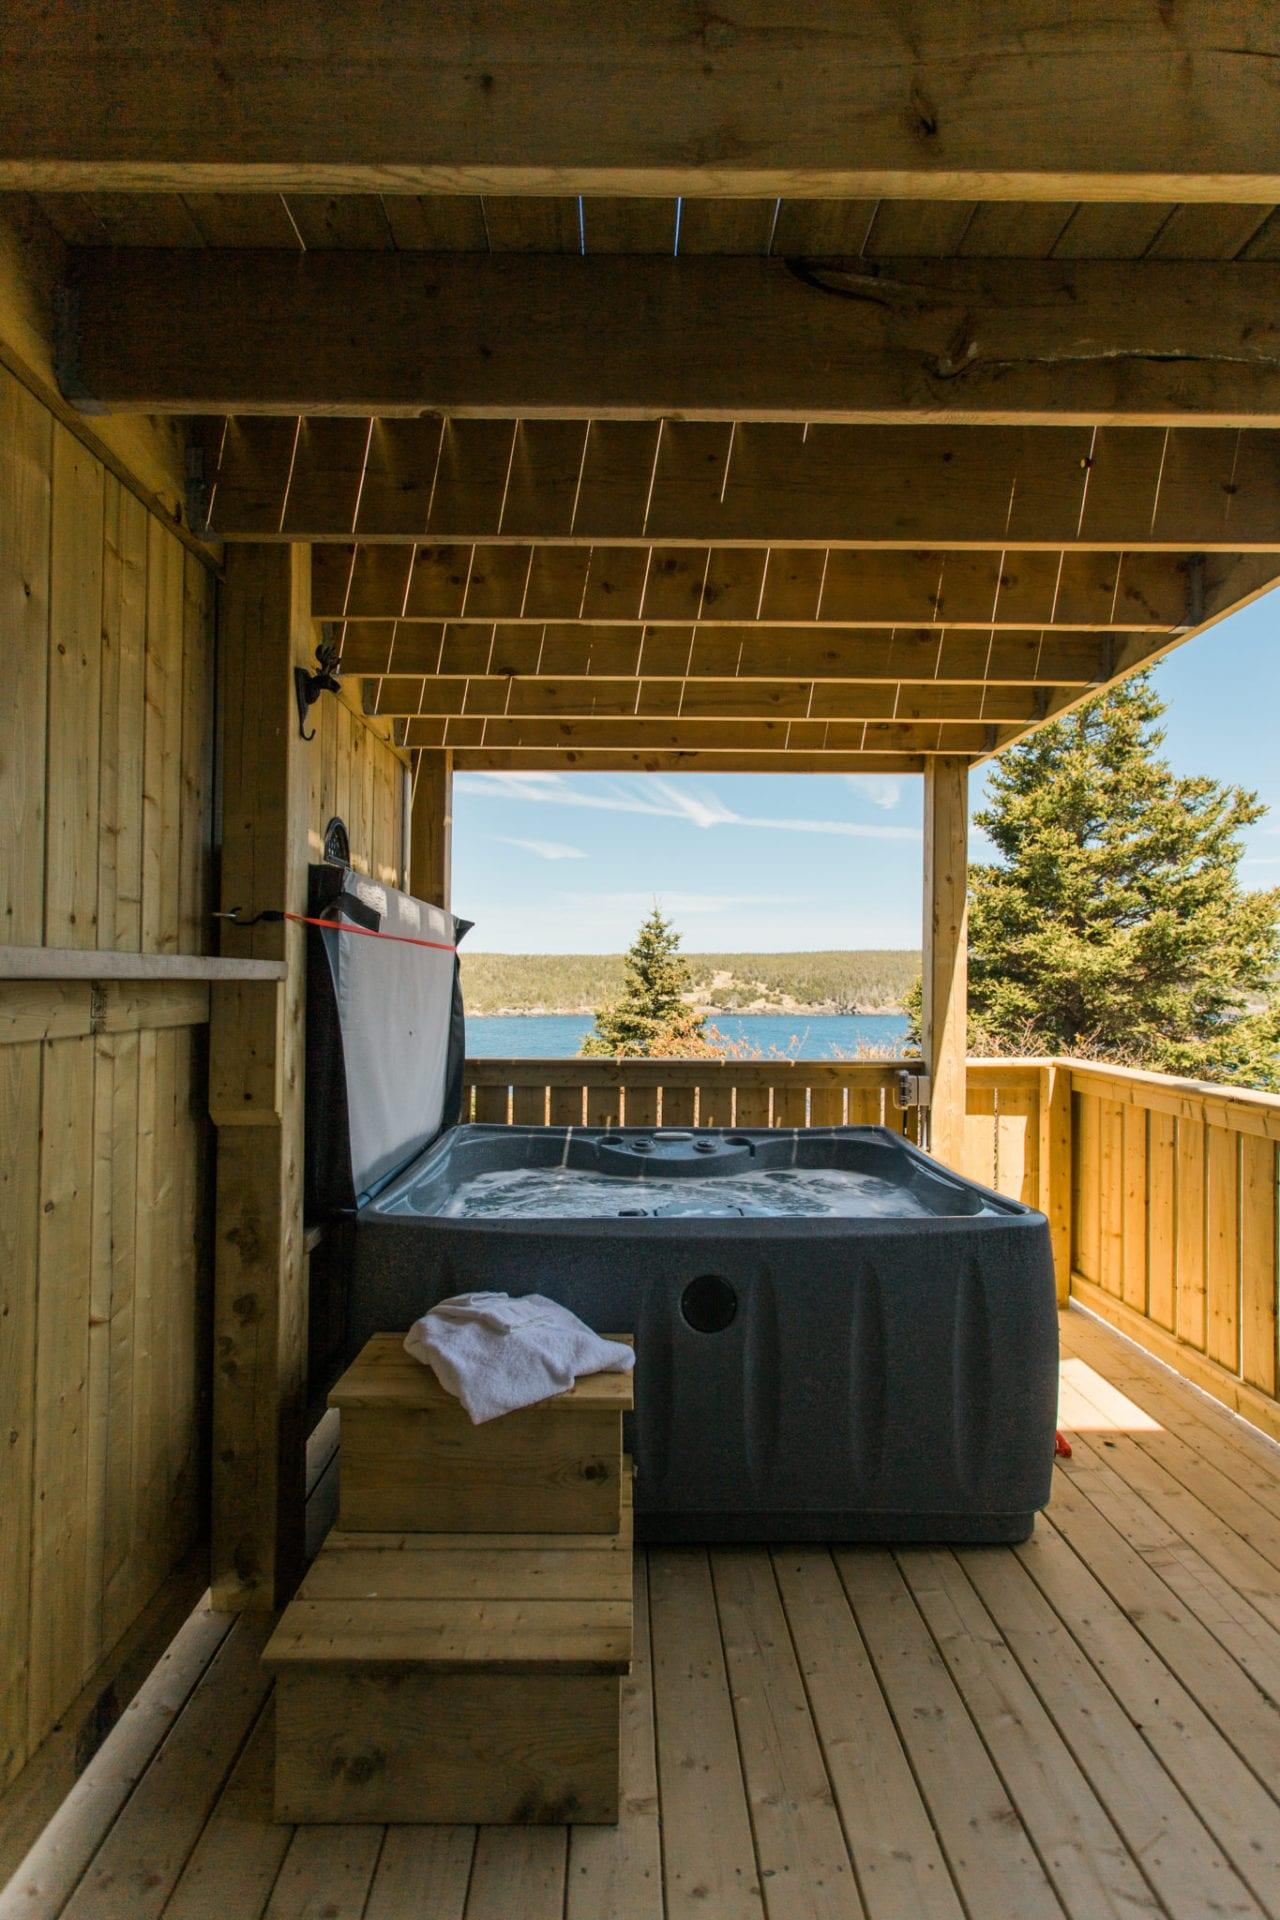 Humpback Whale Suite Private Hot Tub Deck